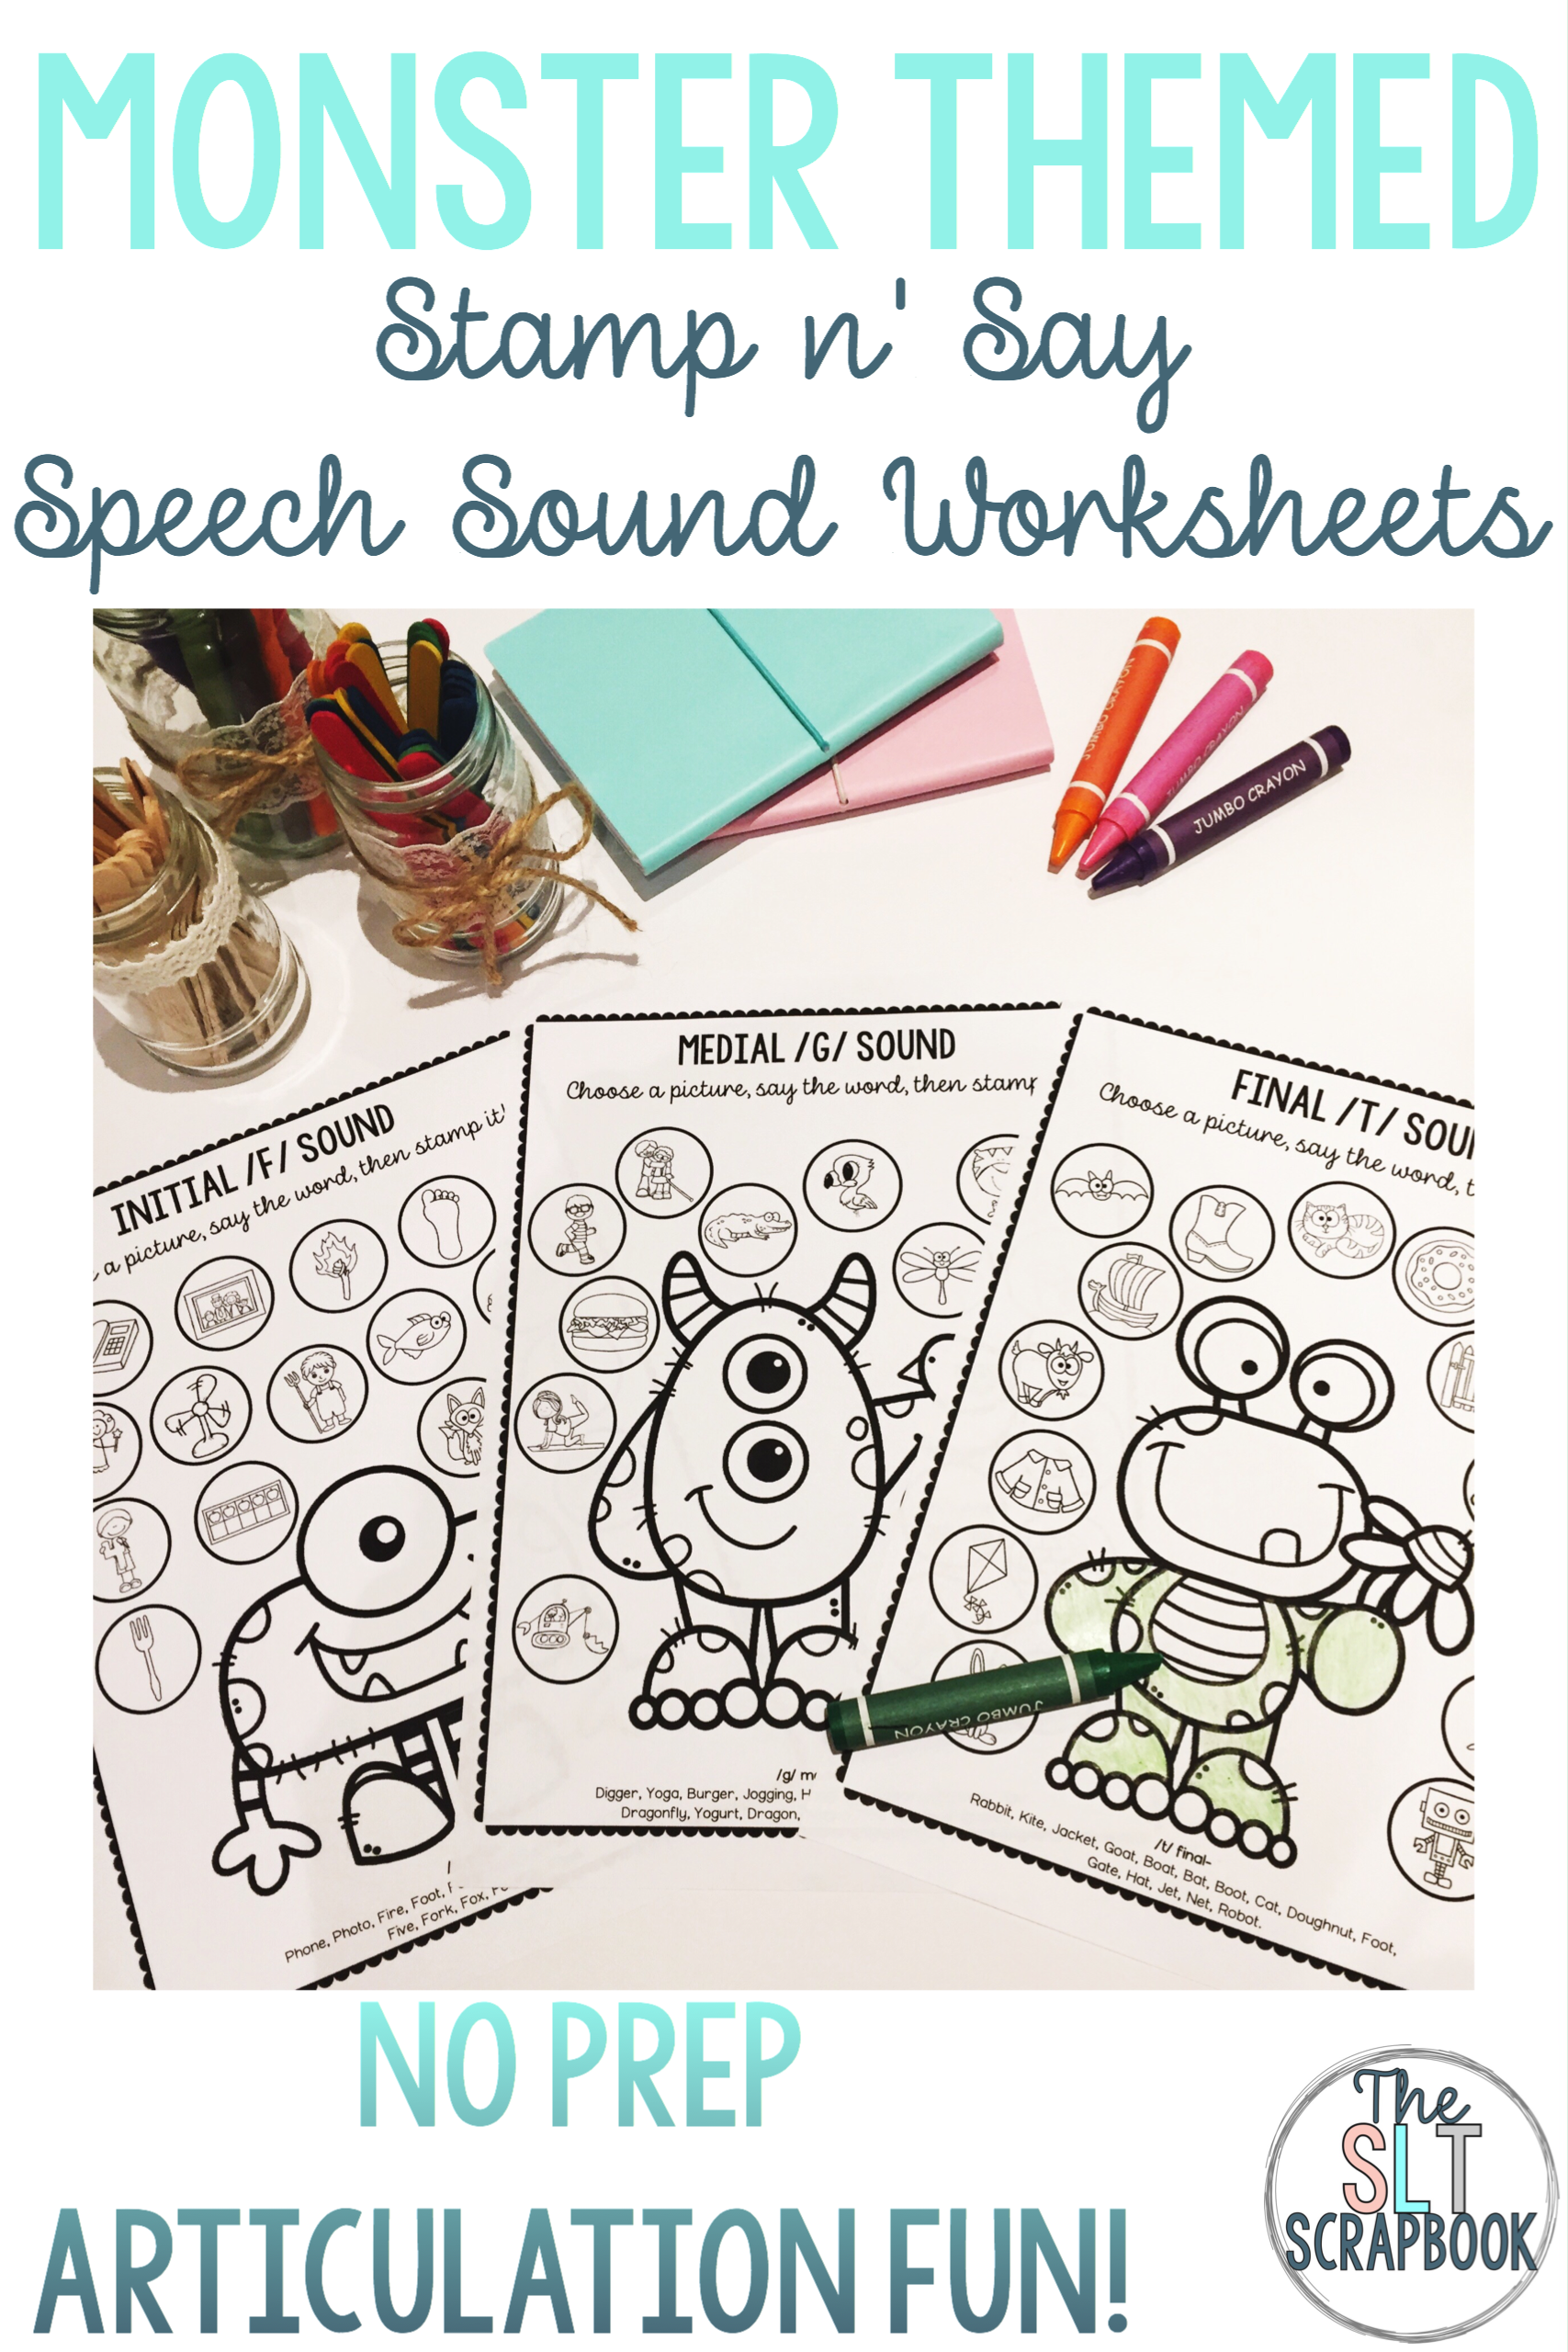 Monster Themed Speech Sound Worksheets No Prep